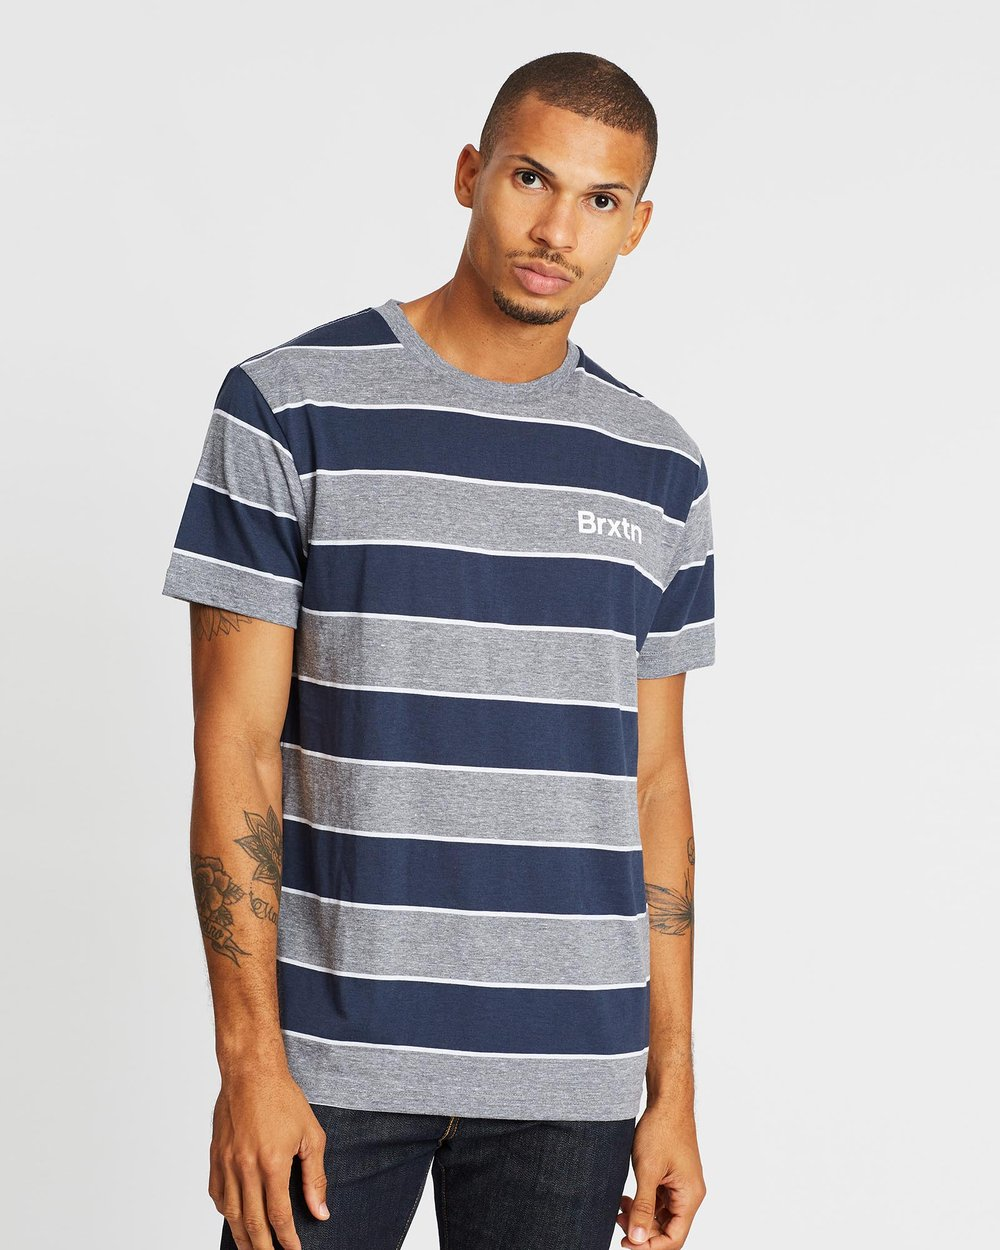 Men/'s Brixton Basic Pocket Short-Sleeve T-Shirt